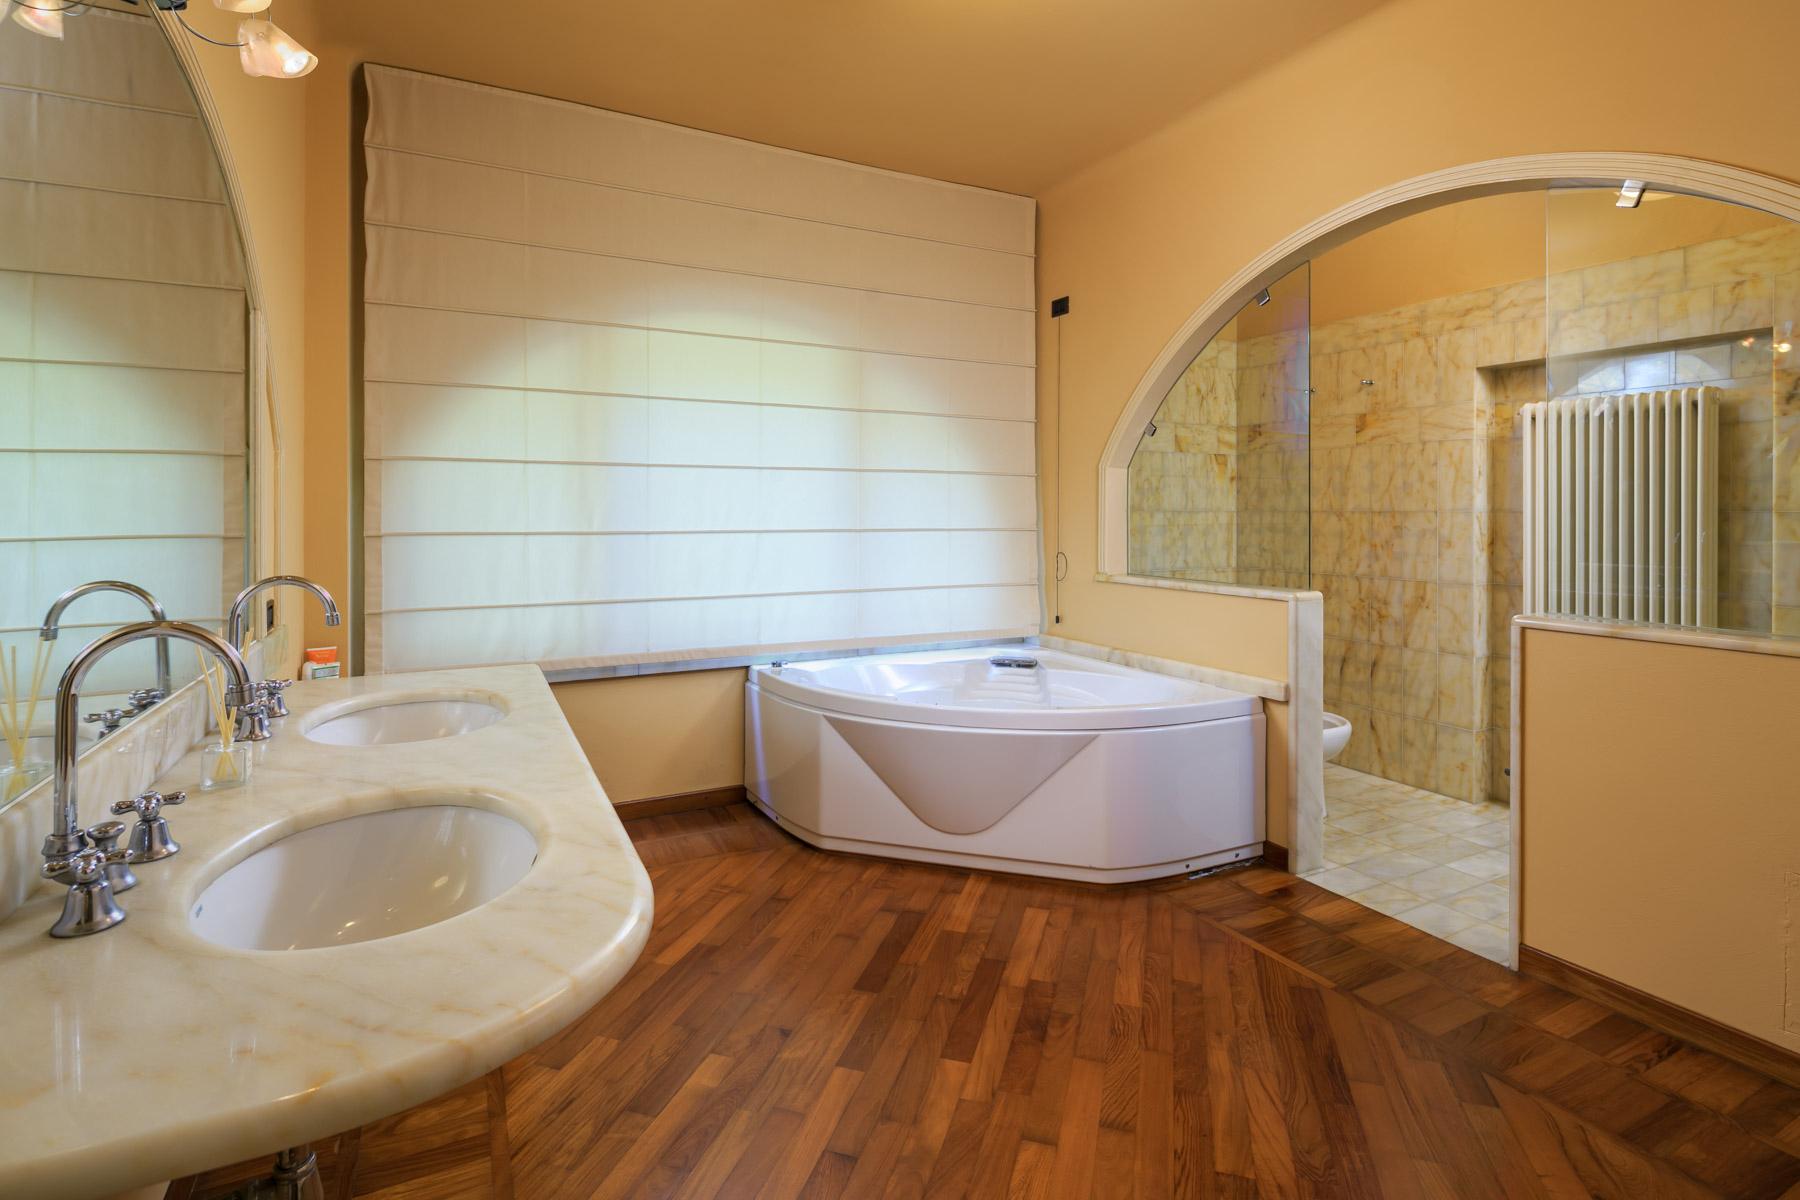 Villa in Vendita a Lucca: 5 locali, 500 mq - Foto 12